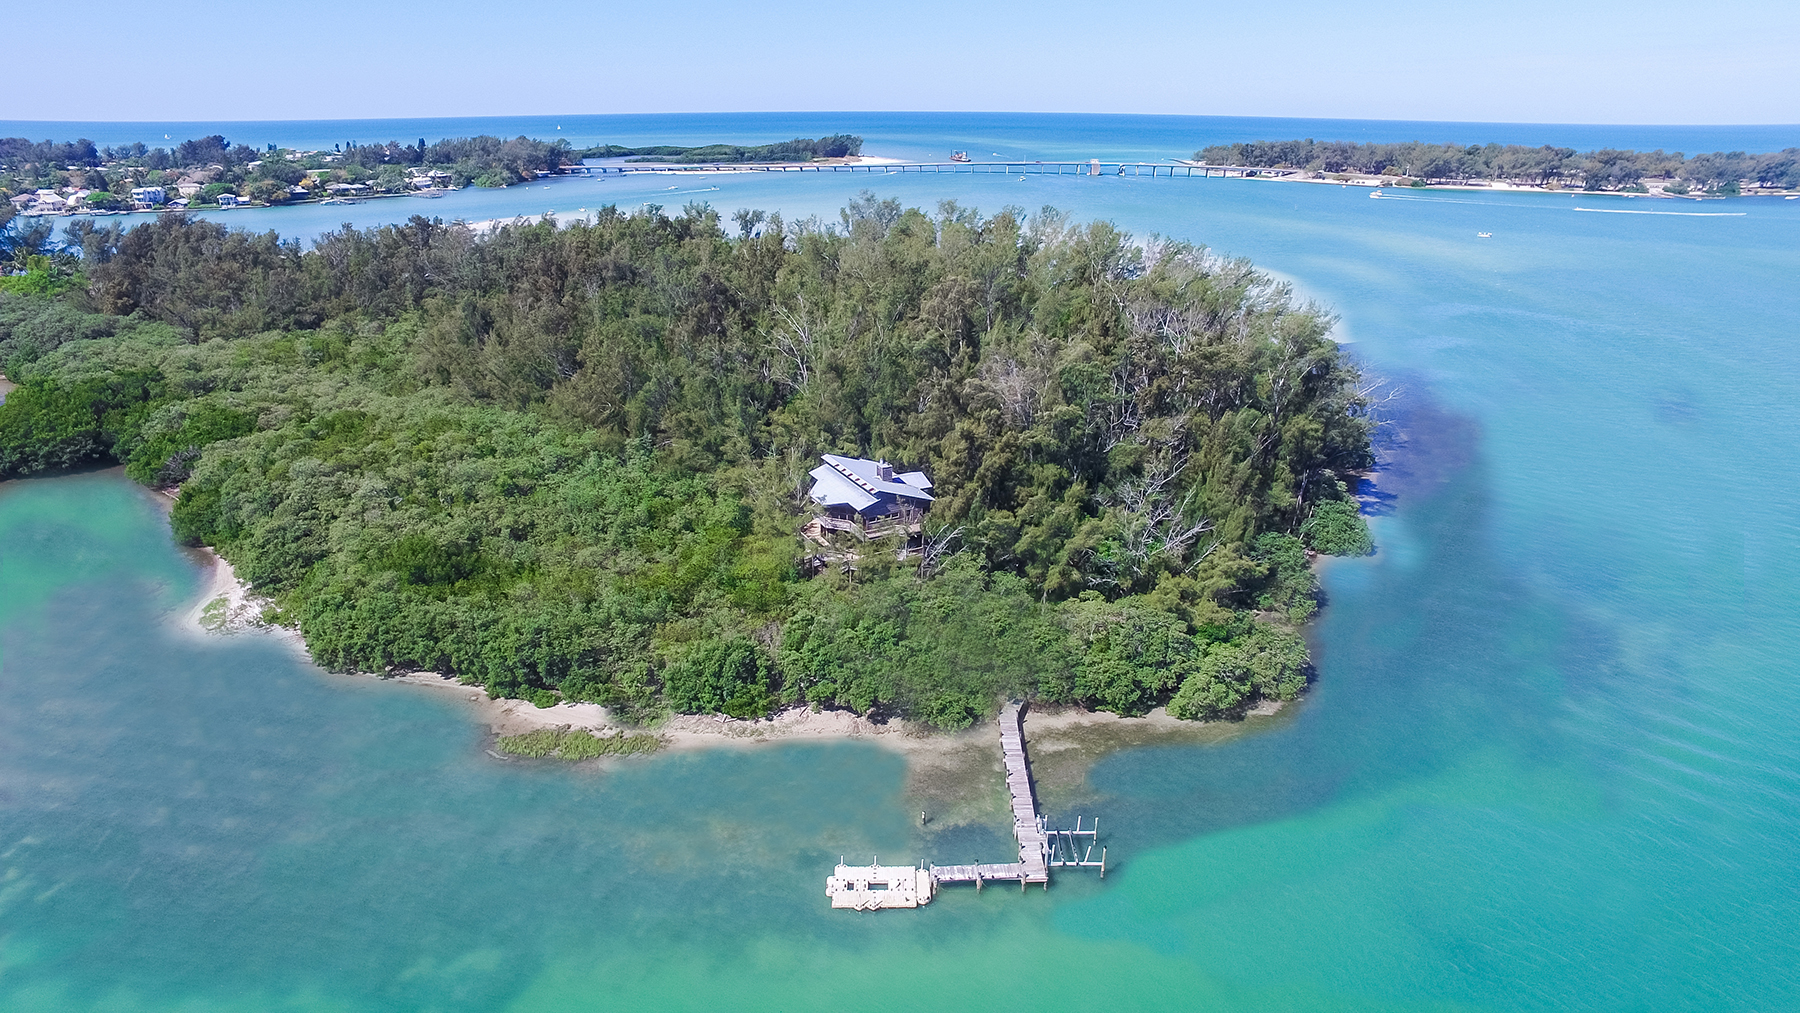 Single Family Home for Sale at JEWFISH KEY 7140 La Lenaire Dr Longboat Key, Florida, 34228 United States